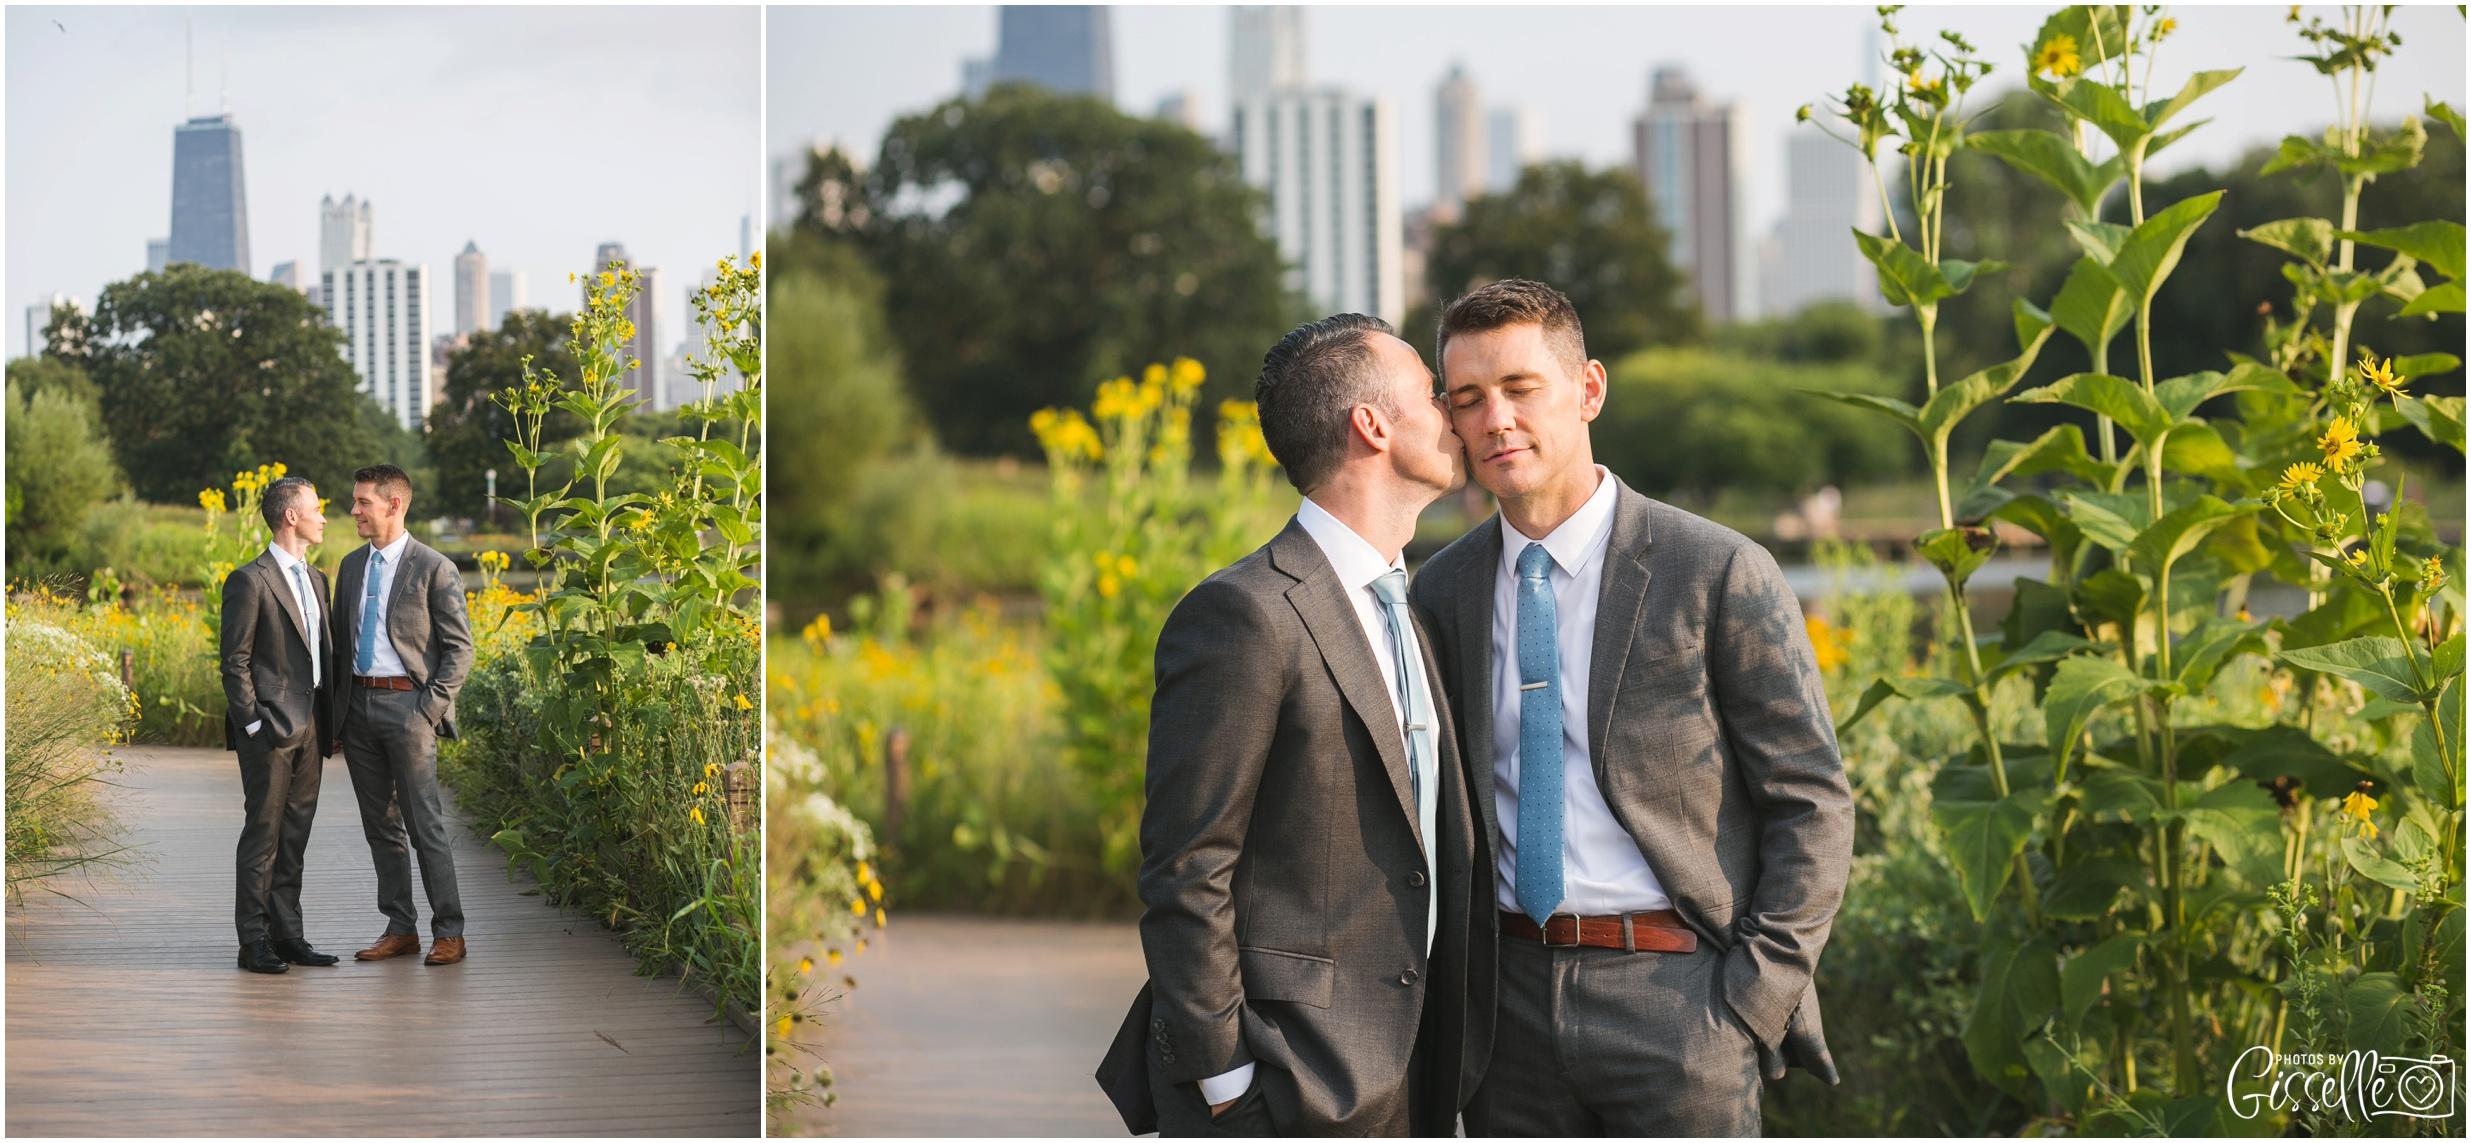 Lincoln Park Wedding_0014.jpg